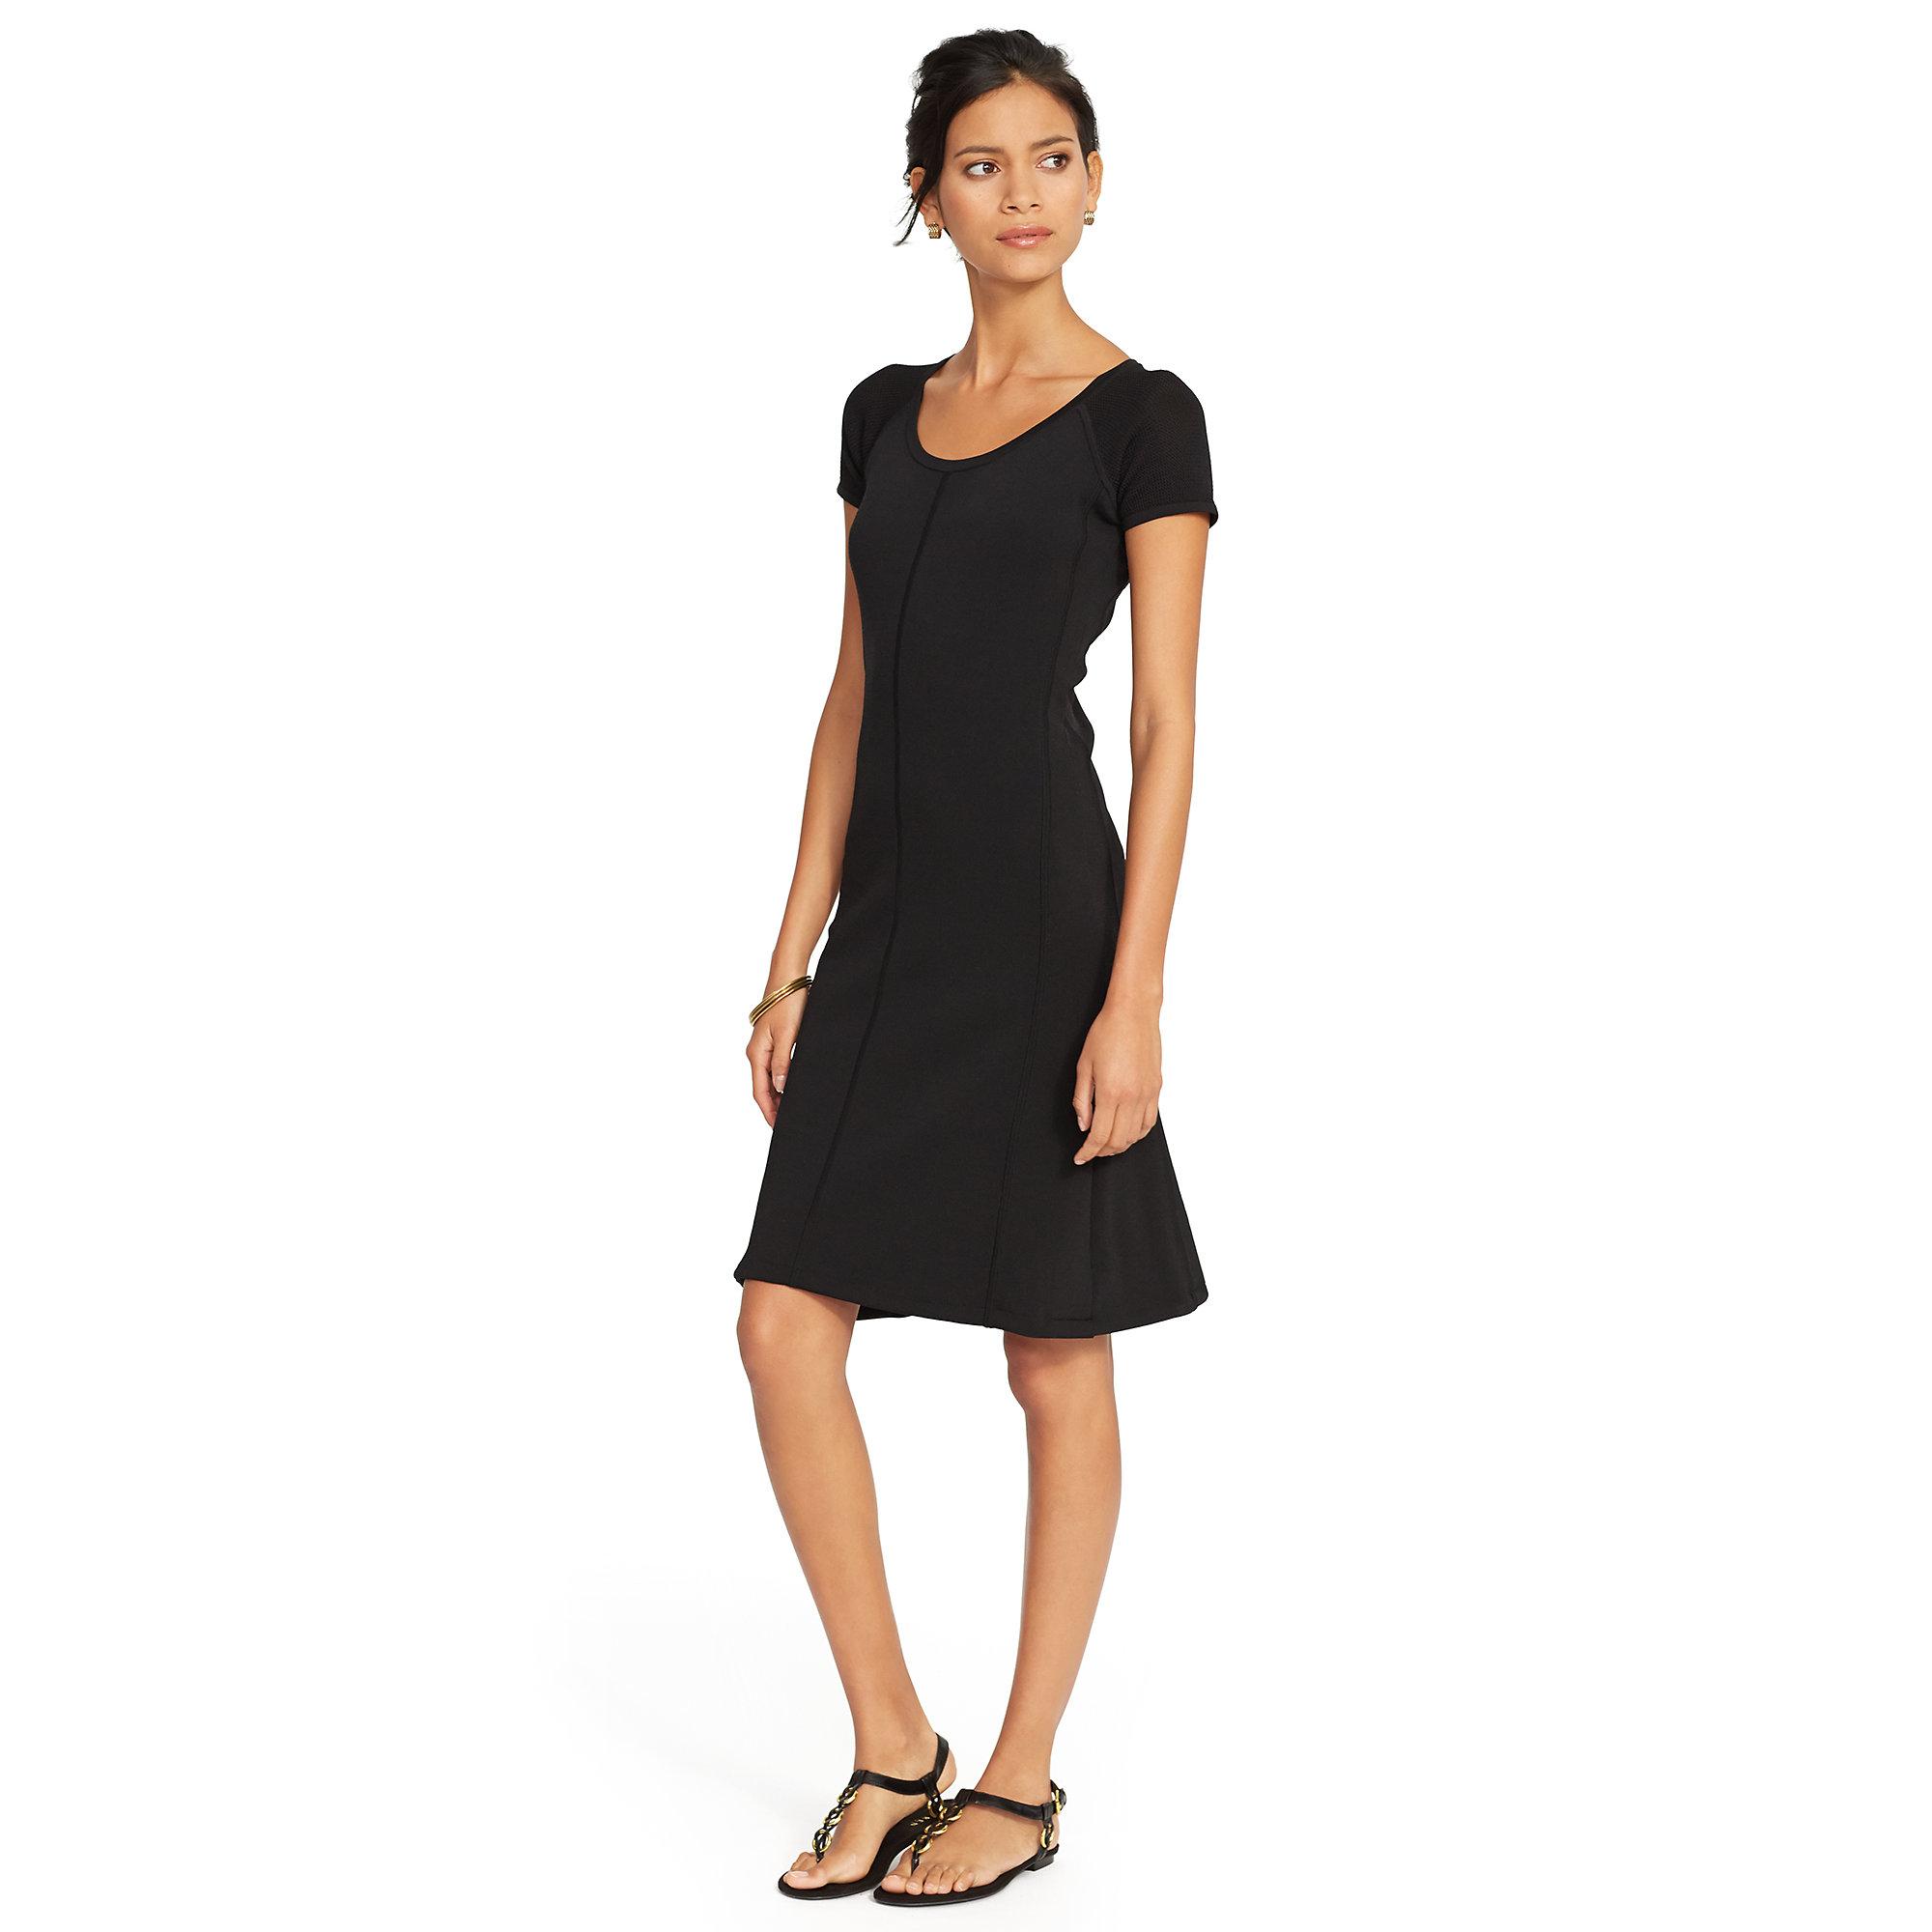 ralph lauren paneled cap sleeved dress in black lyst. Black Bedroom Furniture Sets. Home Design Ideas